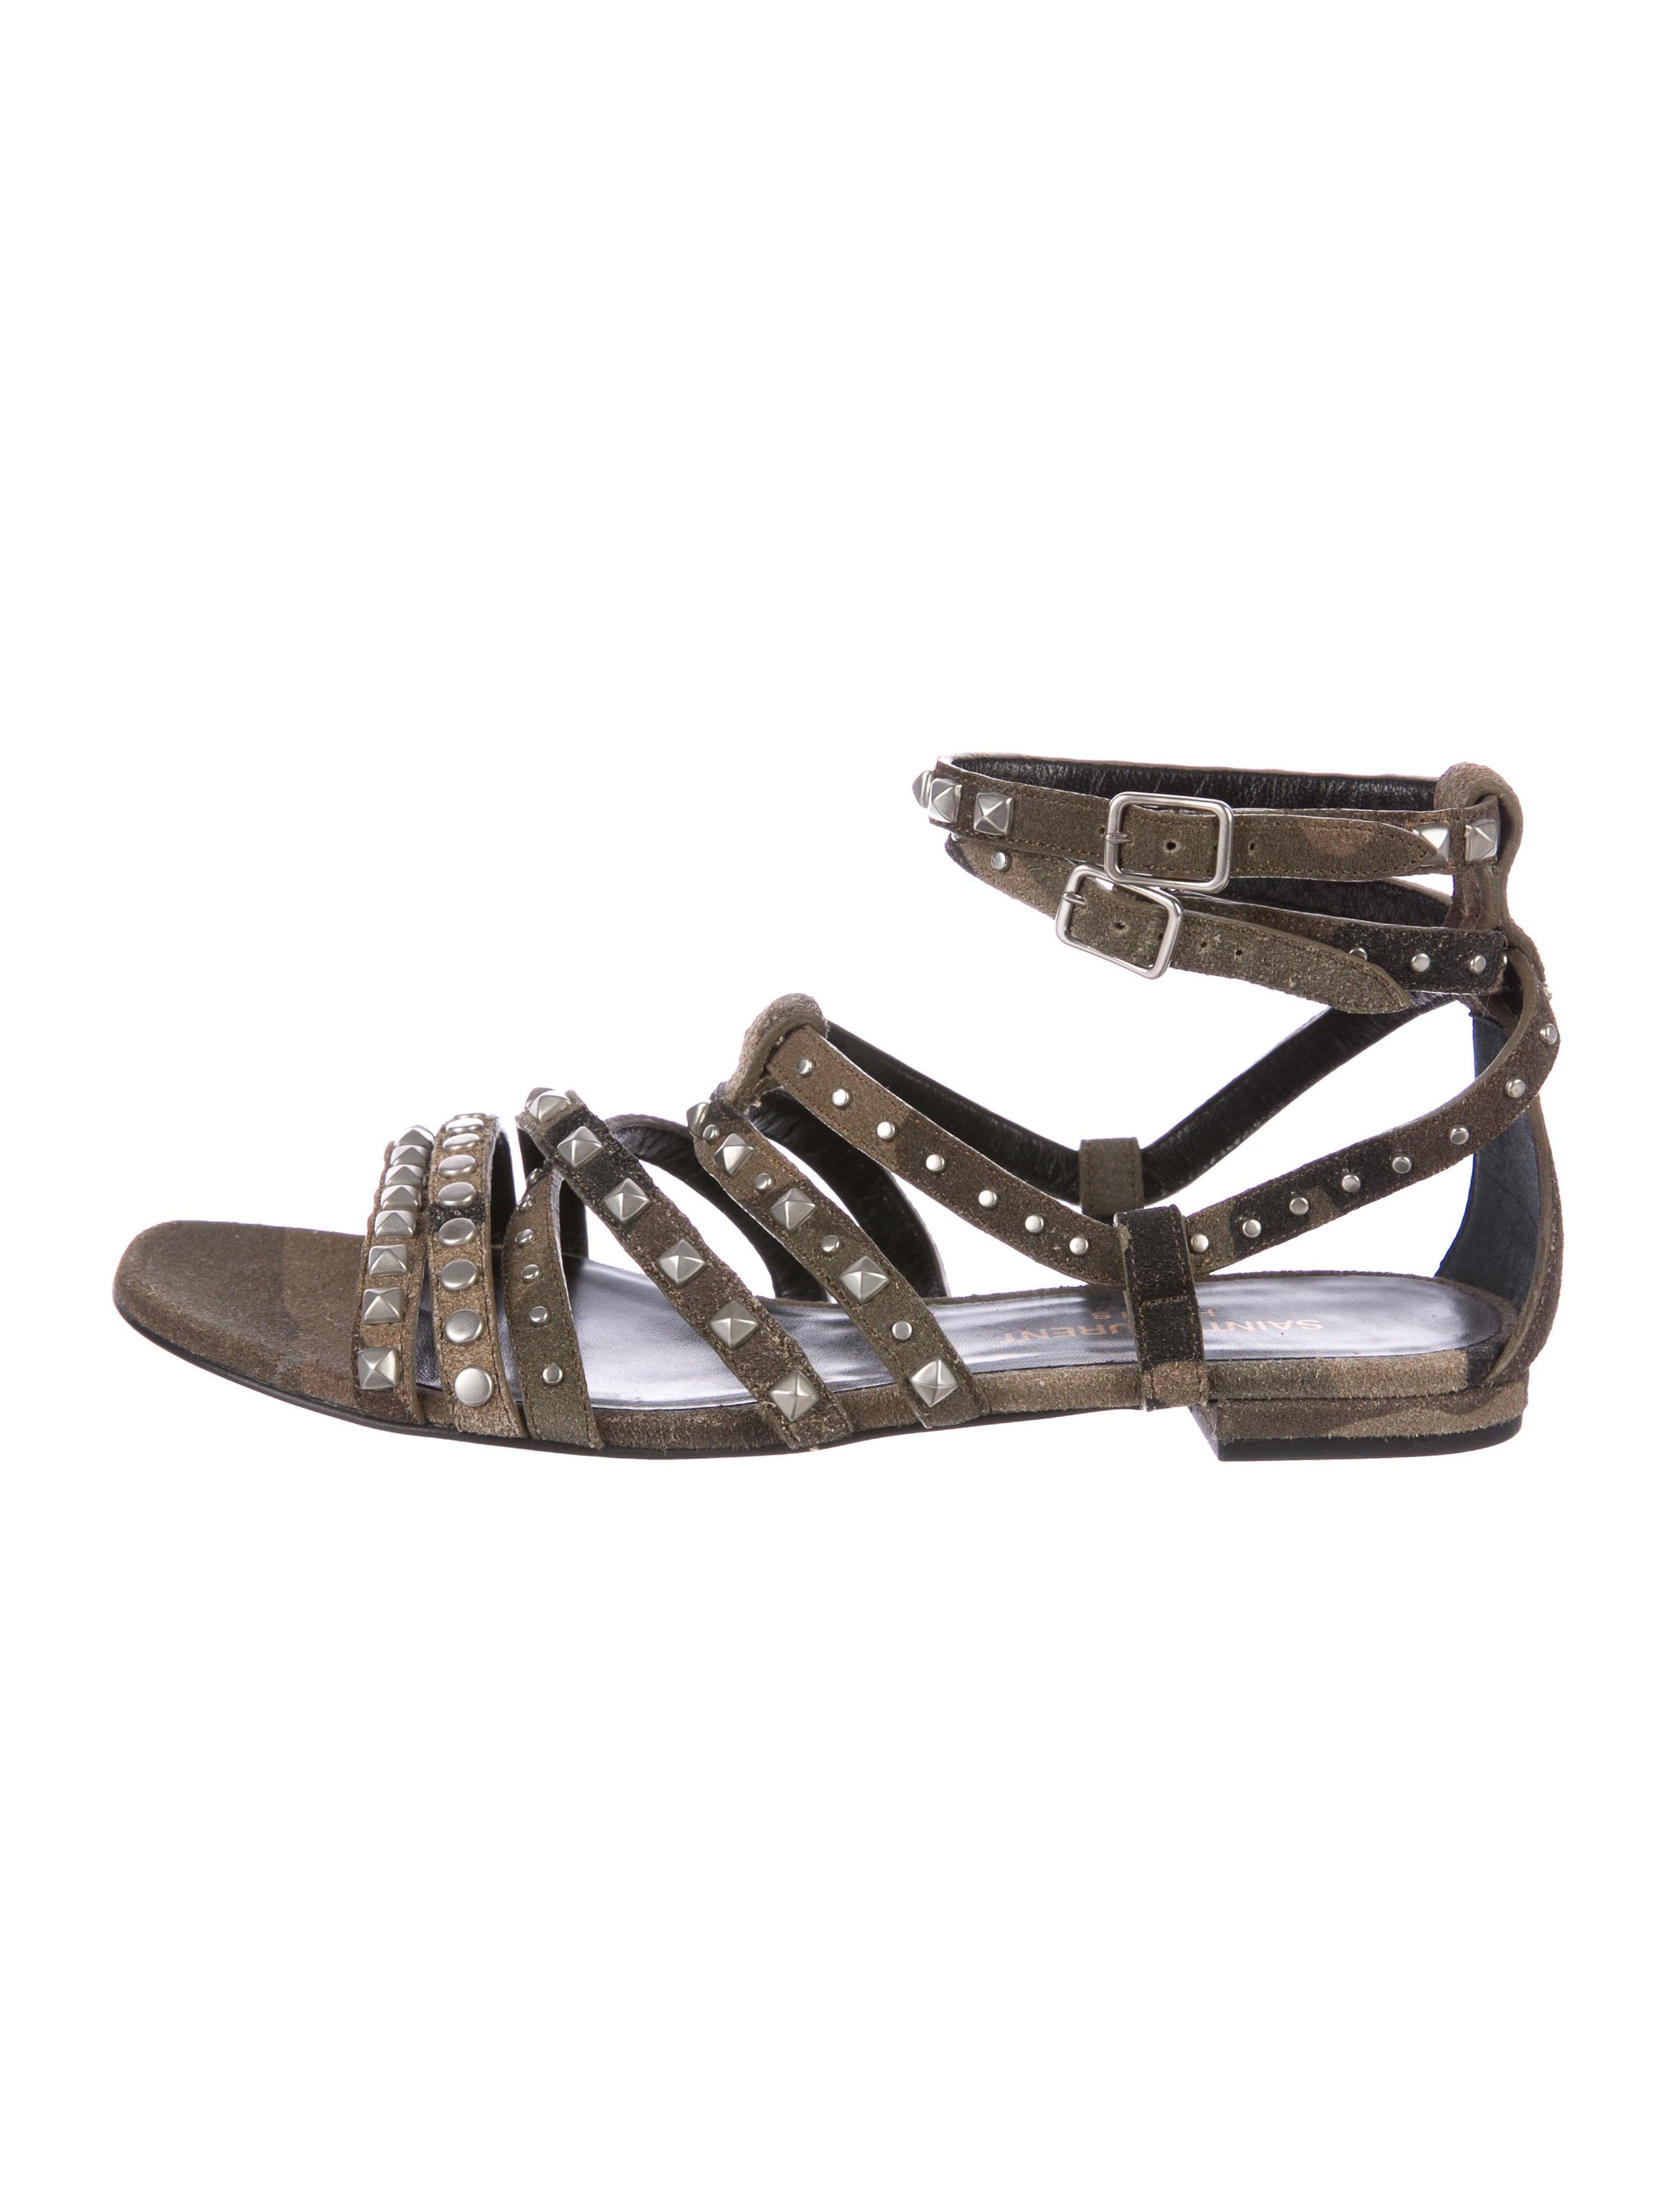 clearance sale online discount in China Saint Laurent Nu Pieds Gladiator Sandals sast online discounts sale online buy cheap fake QoBEFE